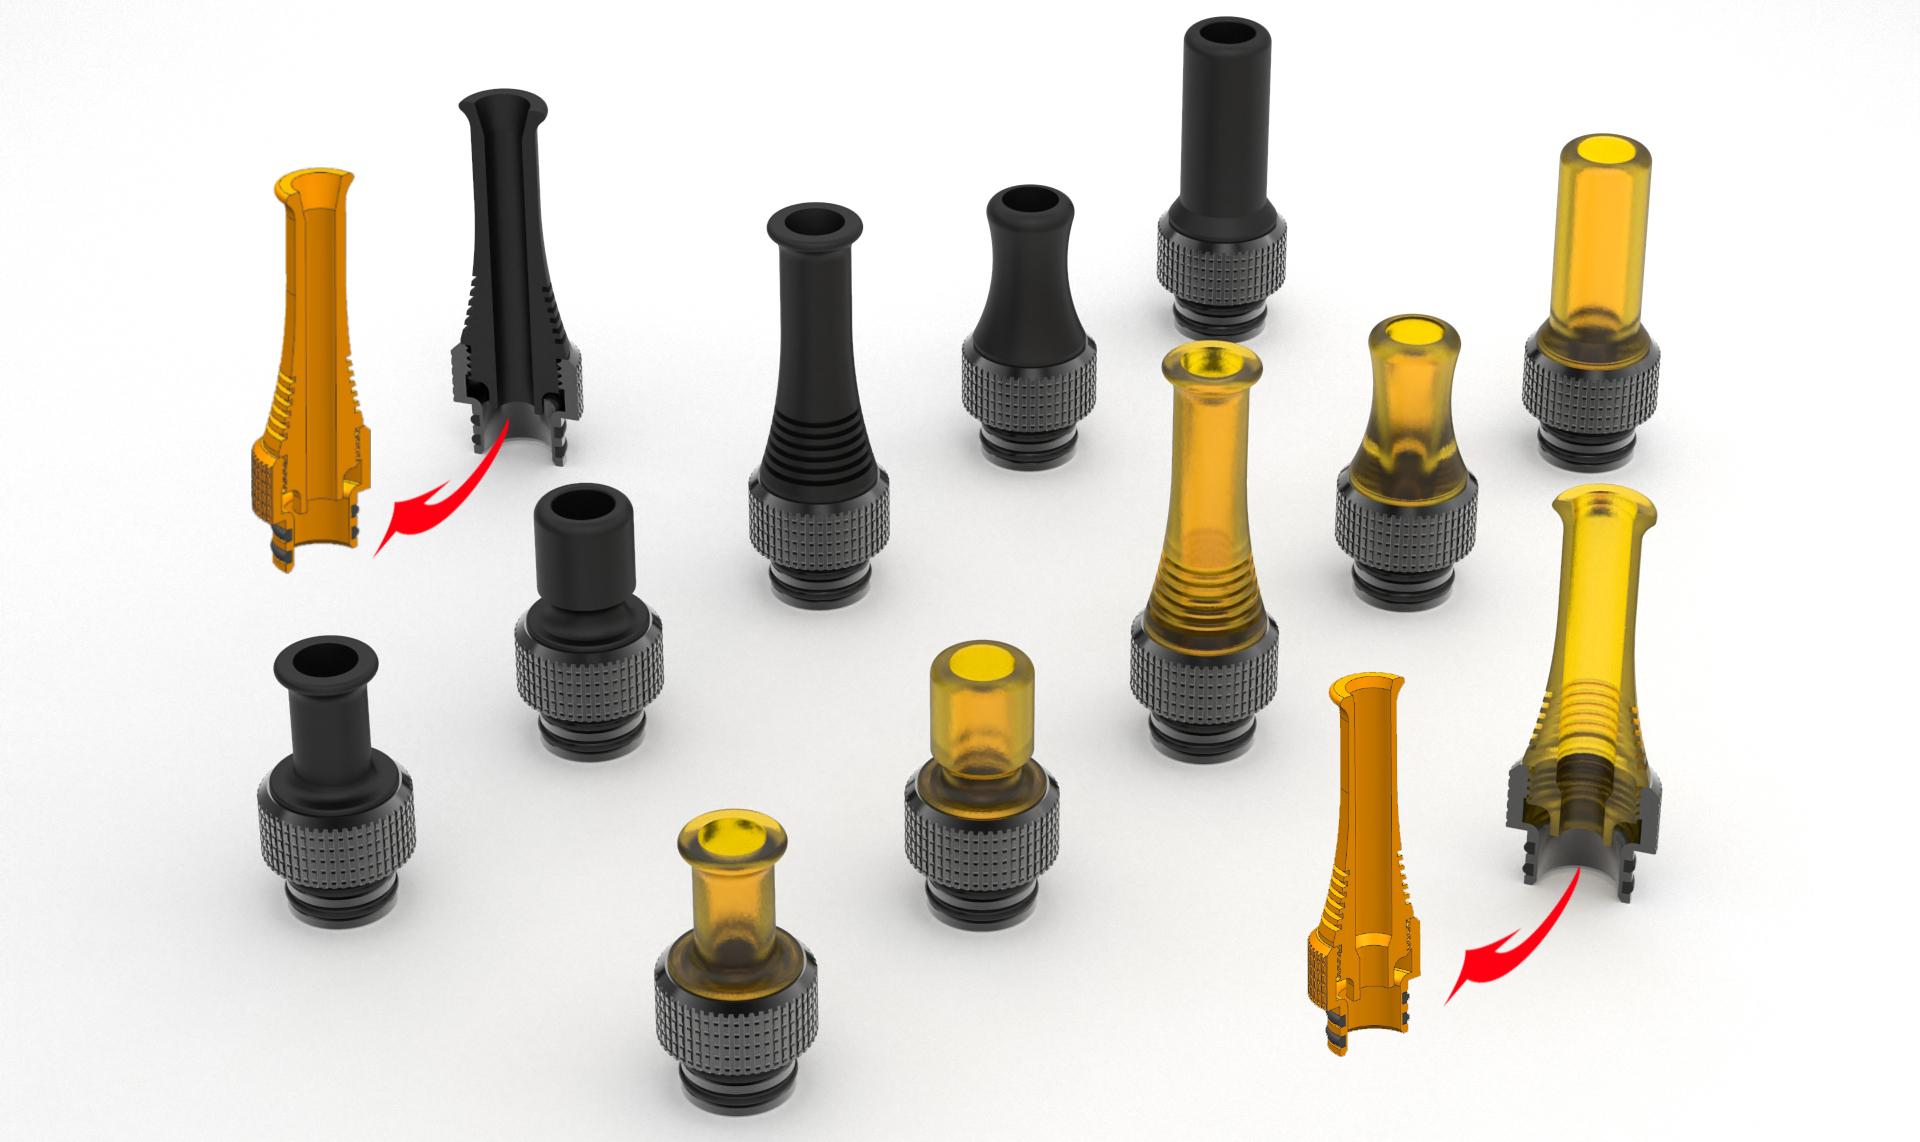 Auguse CG v2 510 Drip Tip